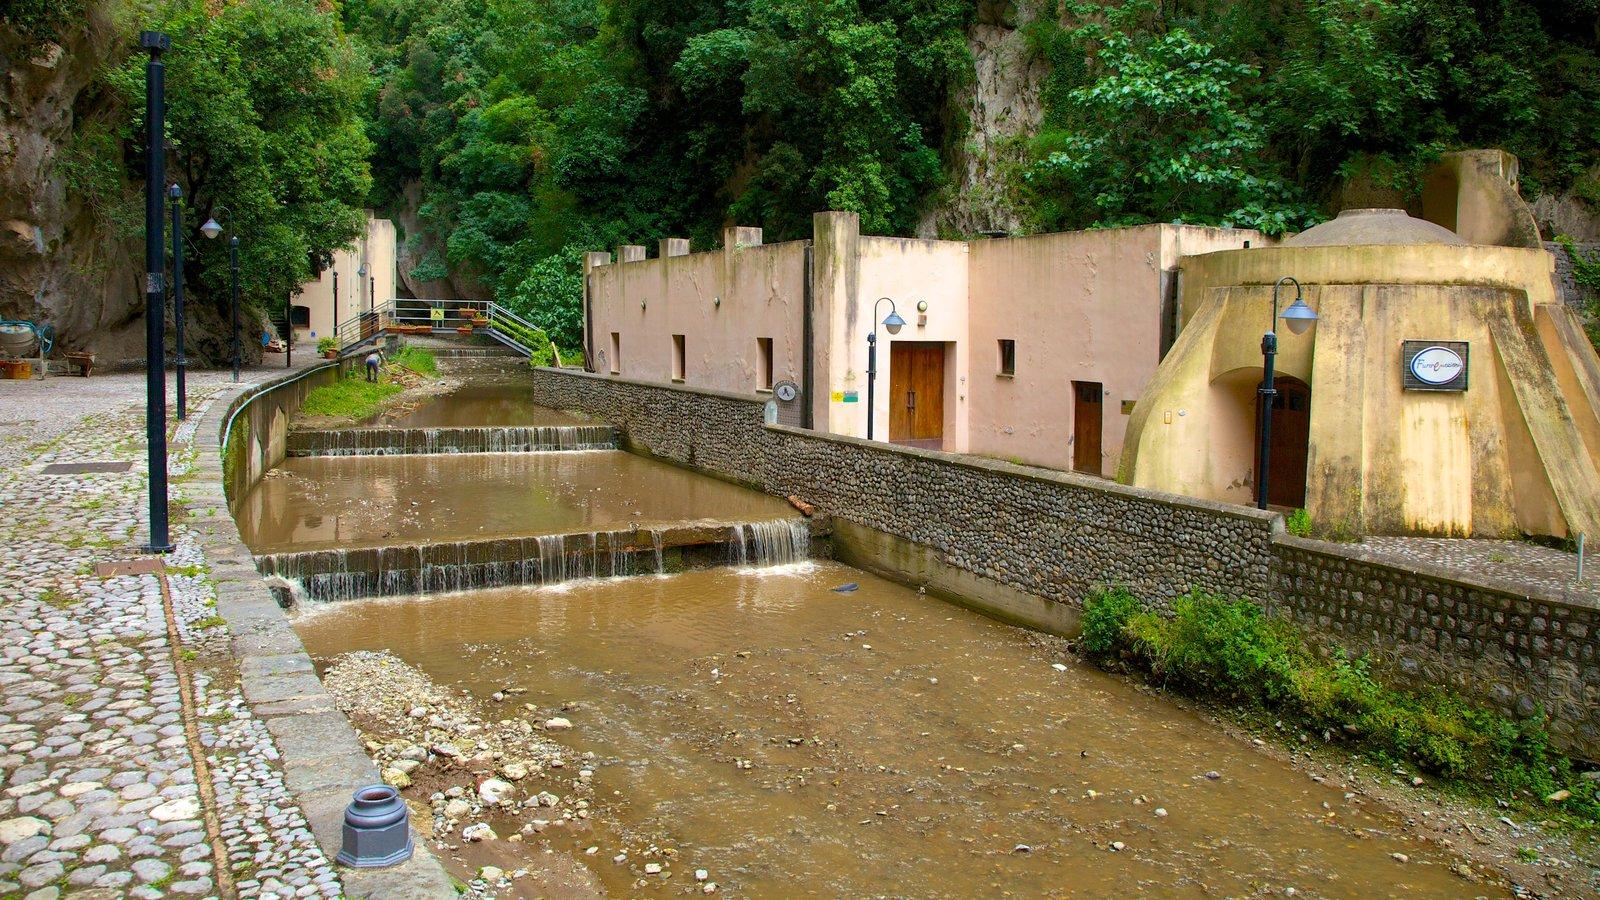 Fiordo di Furore showing a small town or village, a river or creek and street scenes